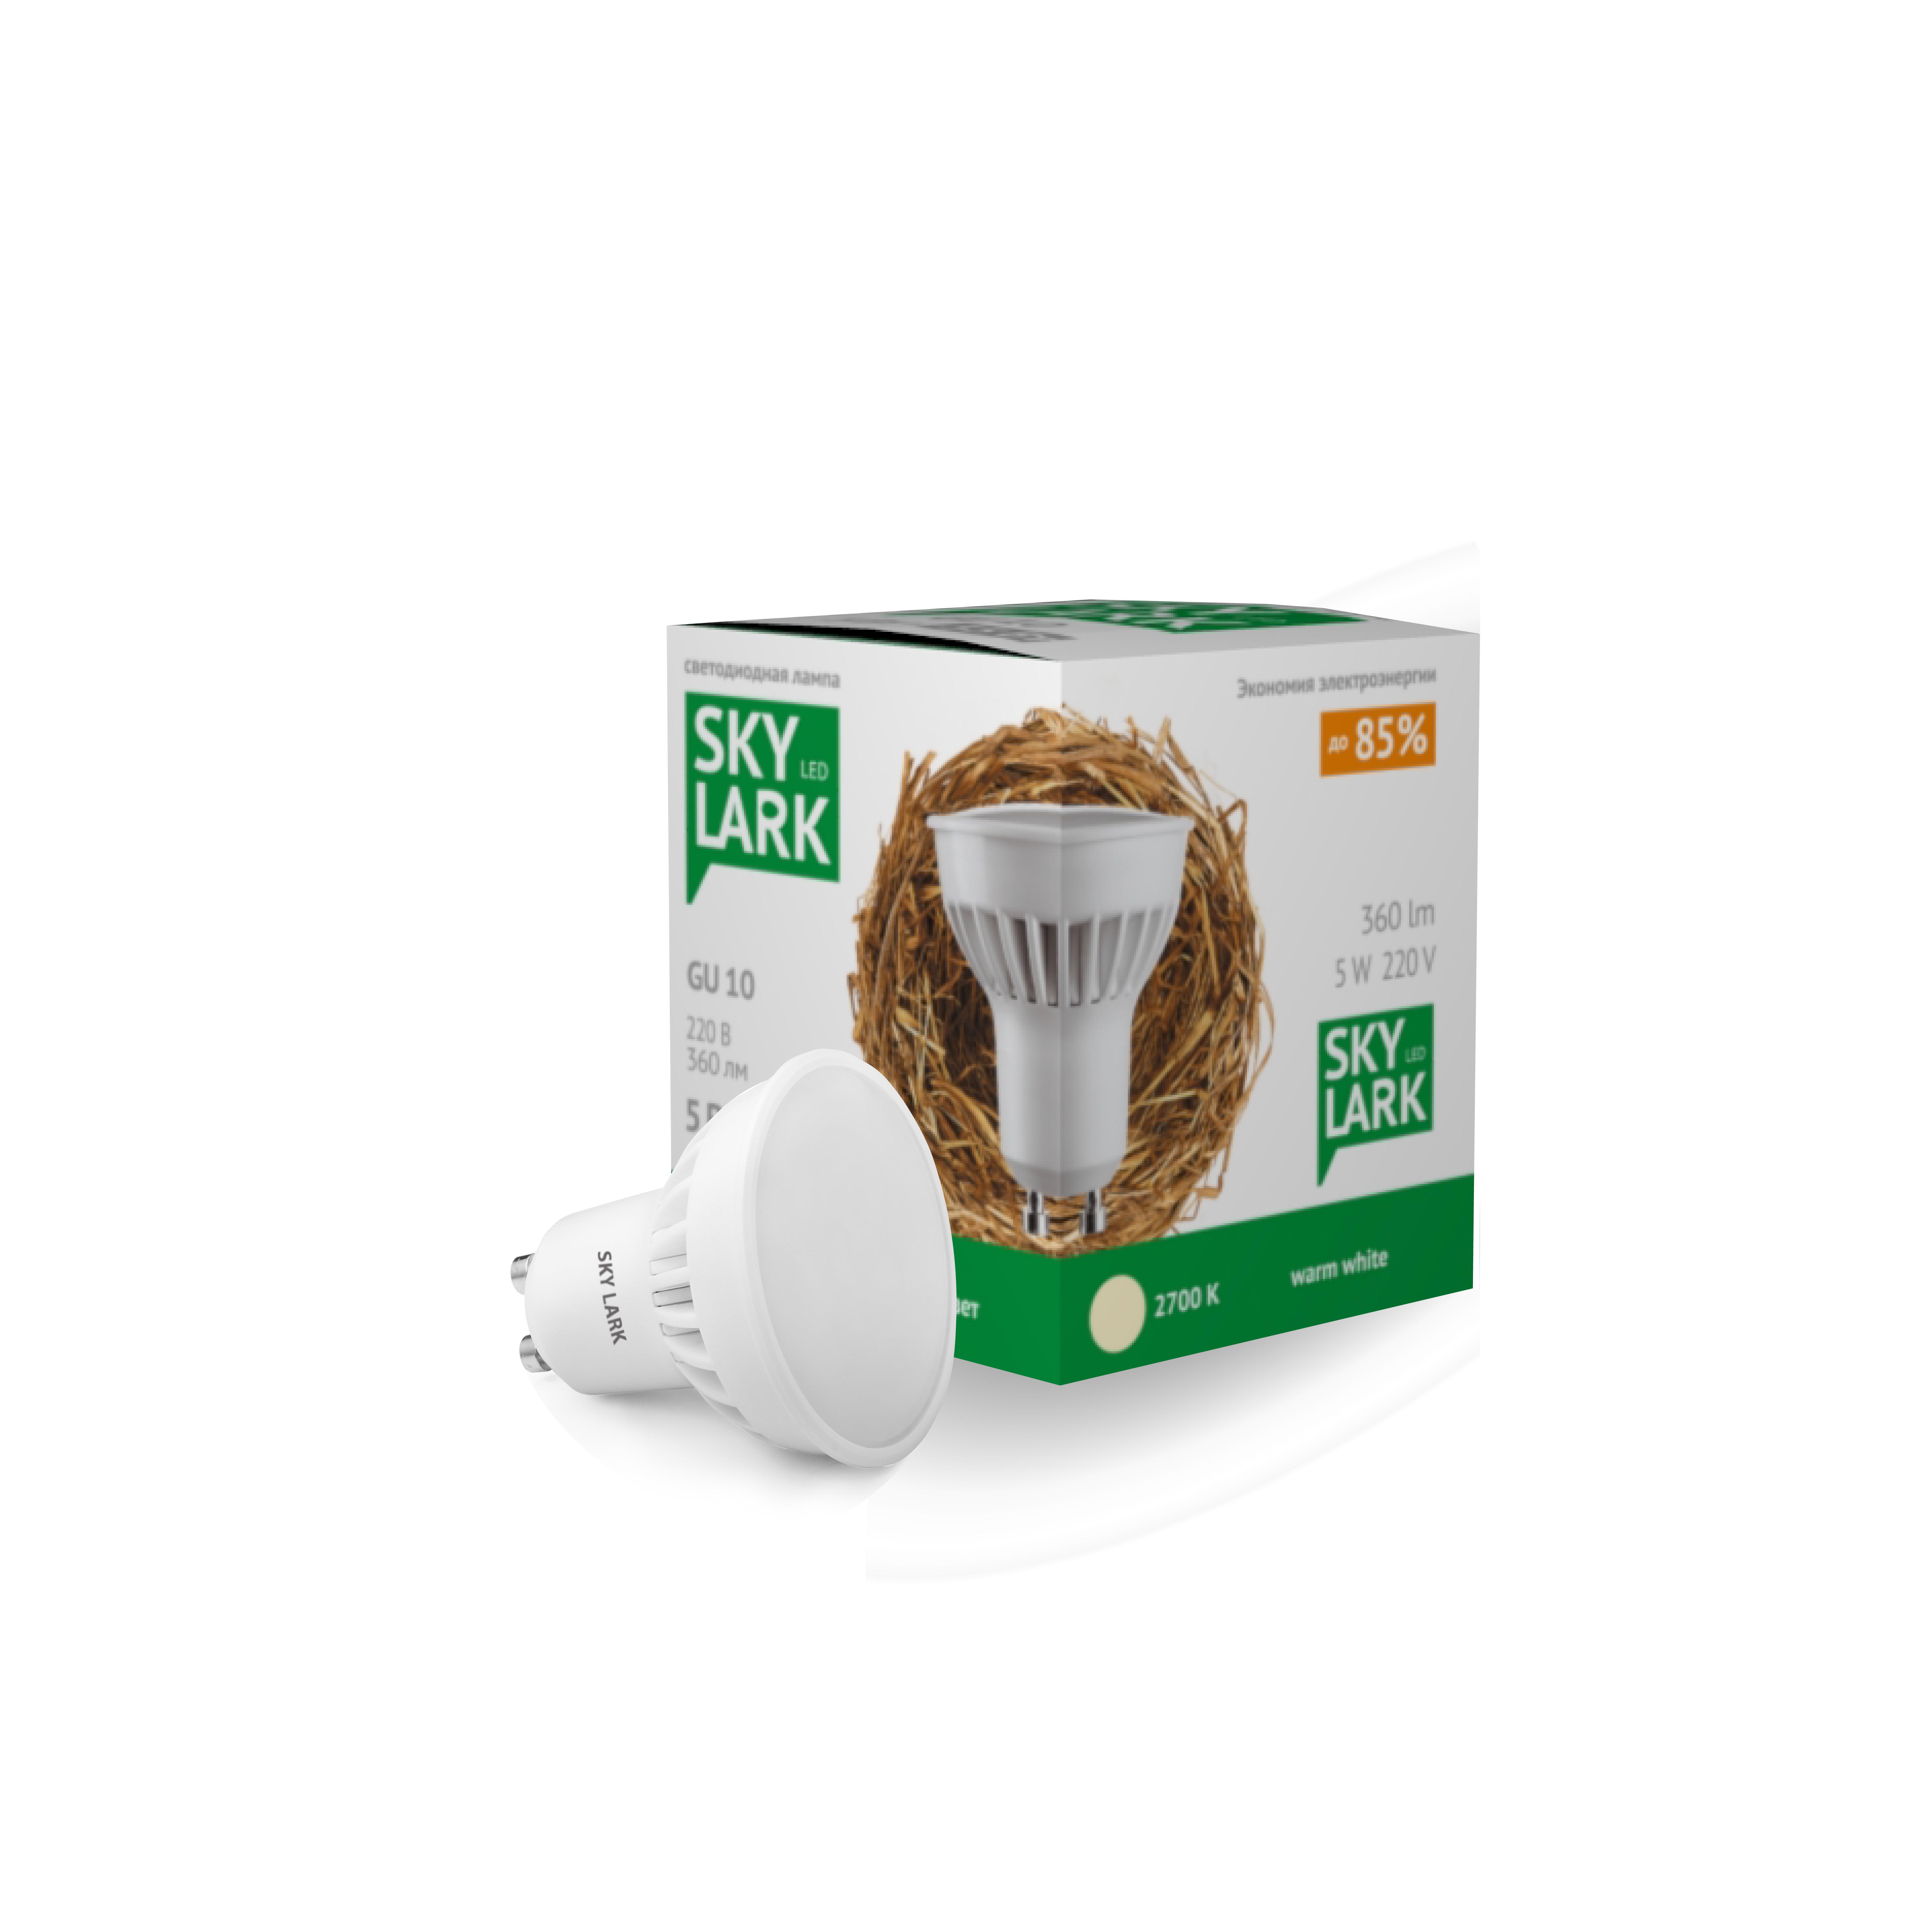 Лампа светодиодная Skylark B023 skylark светодиодная лампа skylark gu5 3 5w 3500k рефлекторная матовая b030